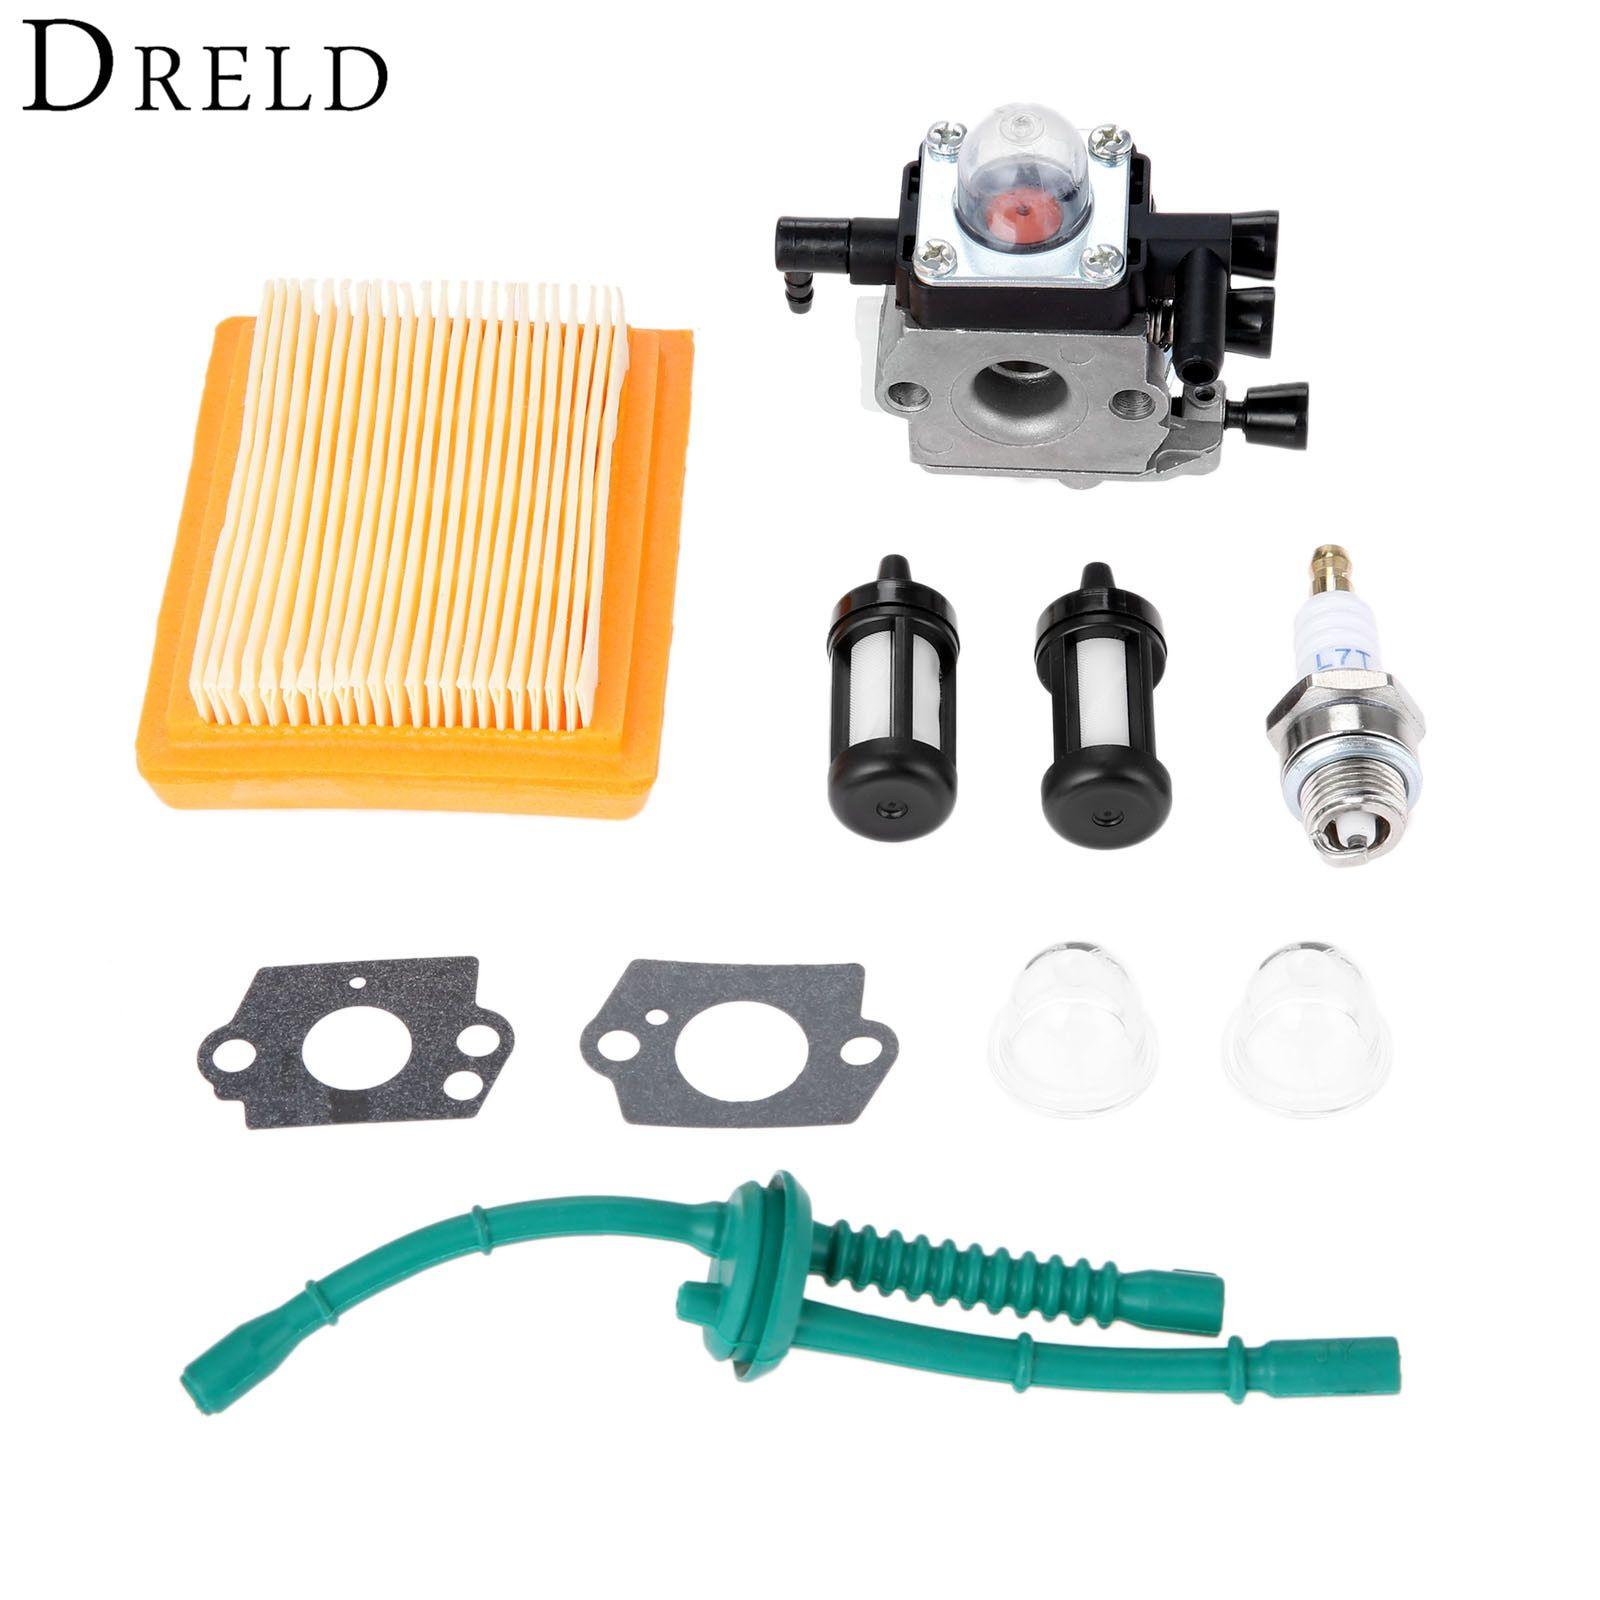 Dreld Carburetor With Gaskets Spark Plug Air Fuel Filter For Stihl